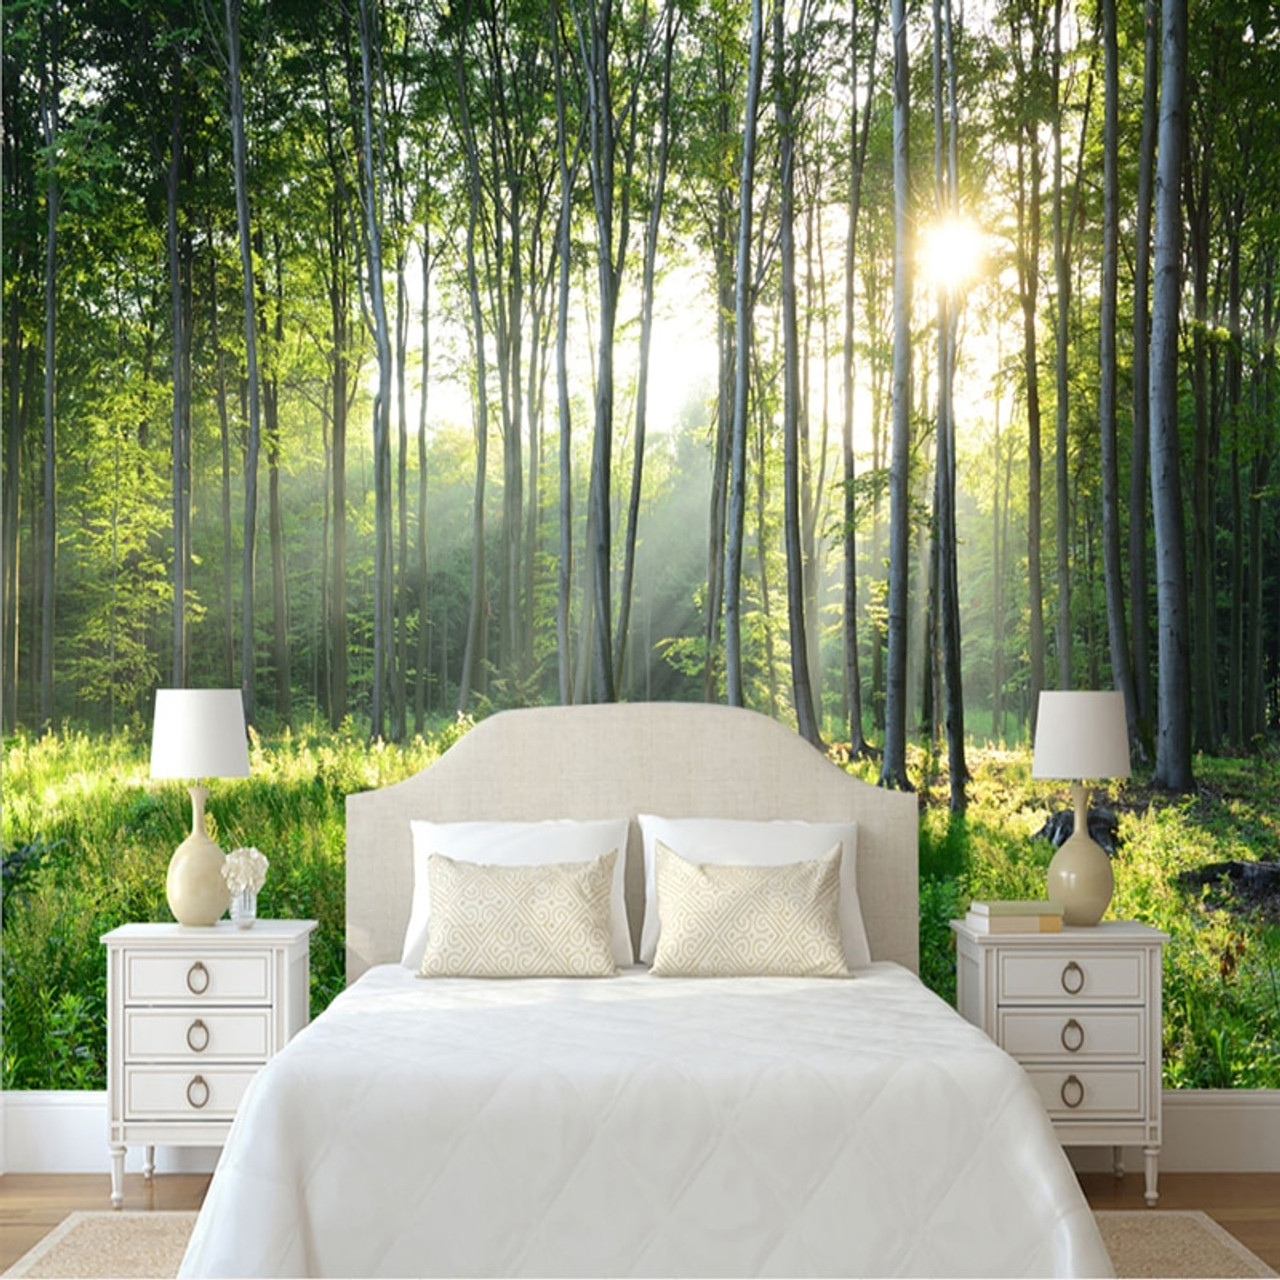 Custom Photo Wallpaper 3d Green Forest Nature Scenery Murals Living